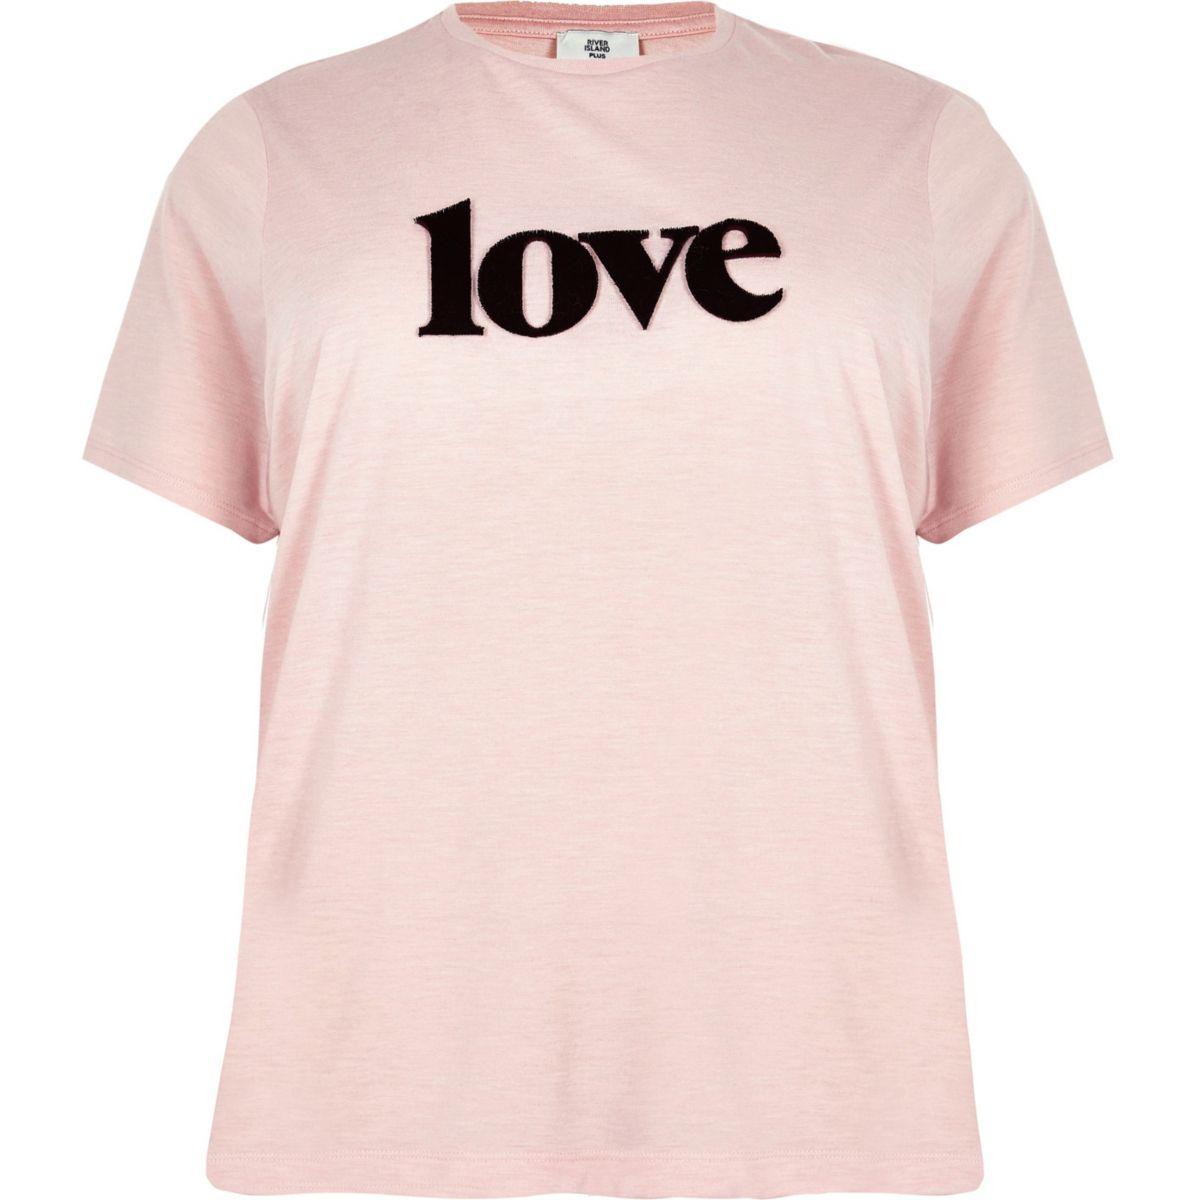 Plus Plus 'love pink Plus pink Plus Plus 'love 'love pink pink Plus 'love pink 'love pink w4OxBIqAXn